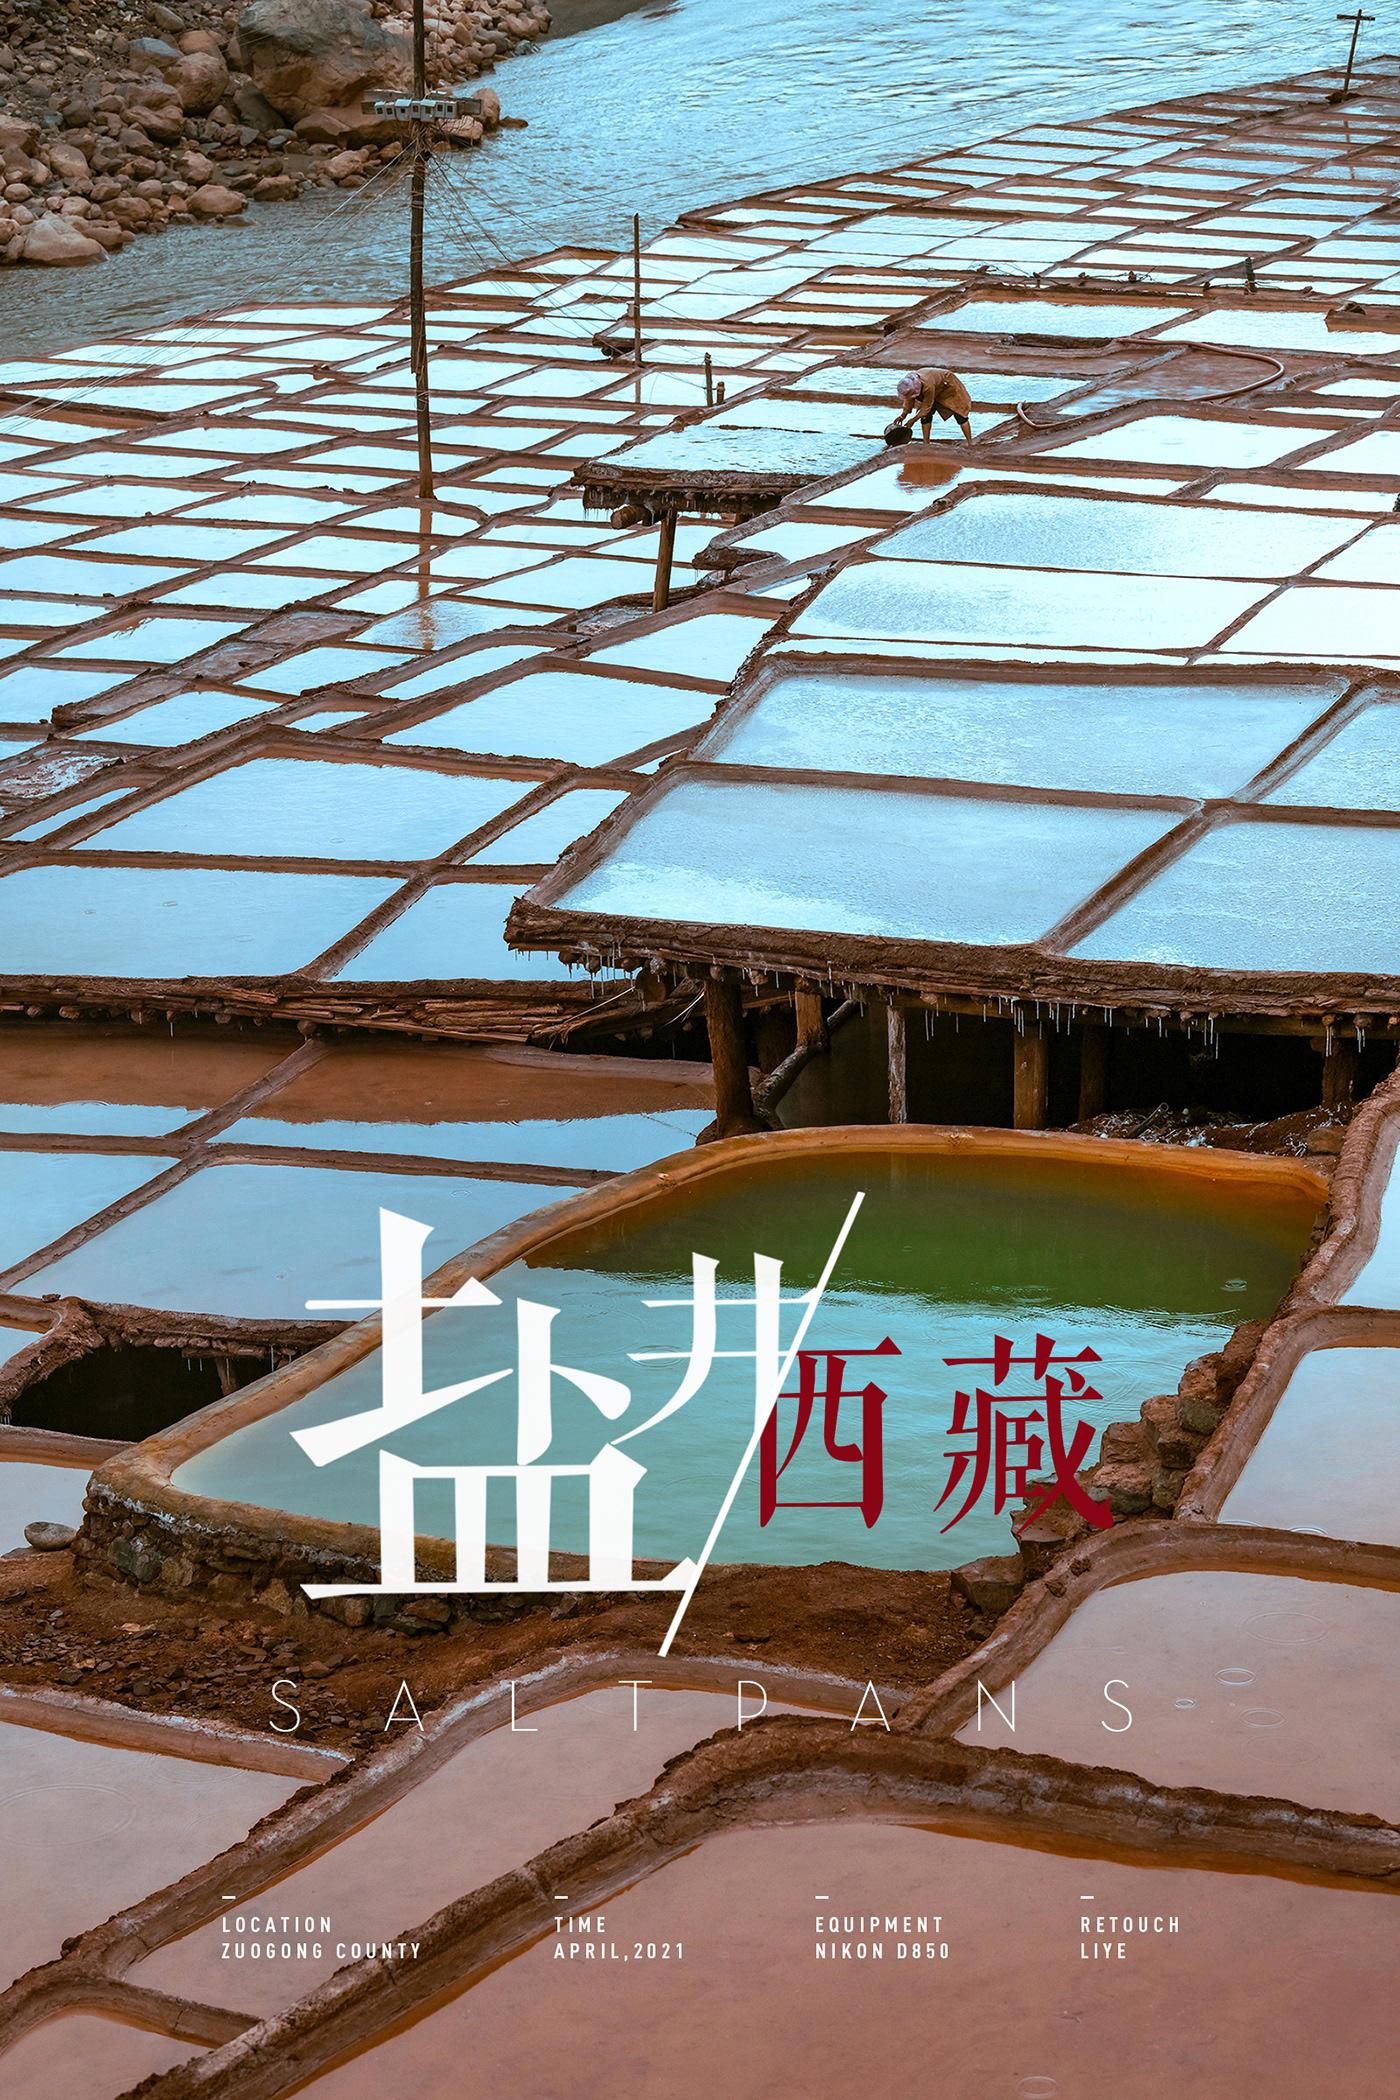 humane Landscape Nature tibet Travel geometric minimalist Documentary